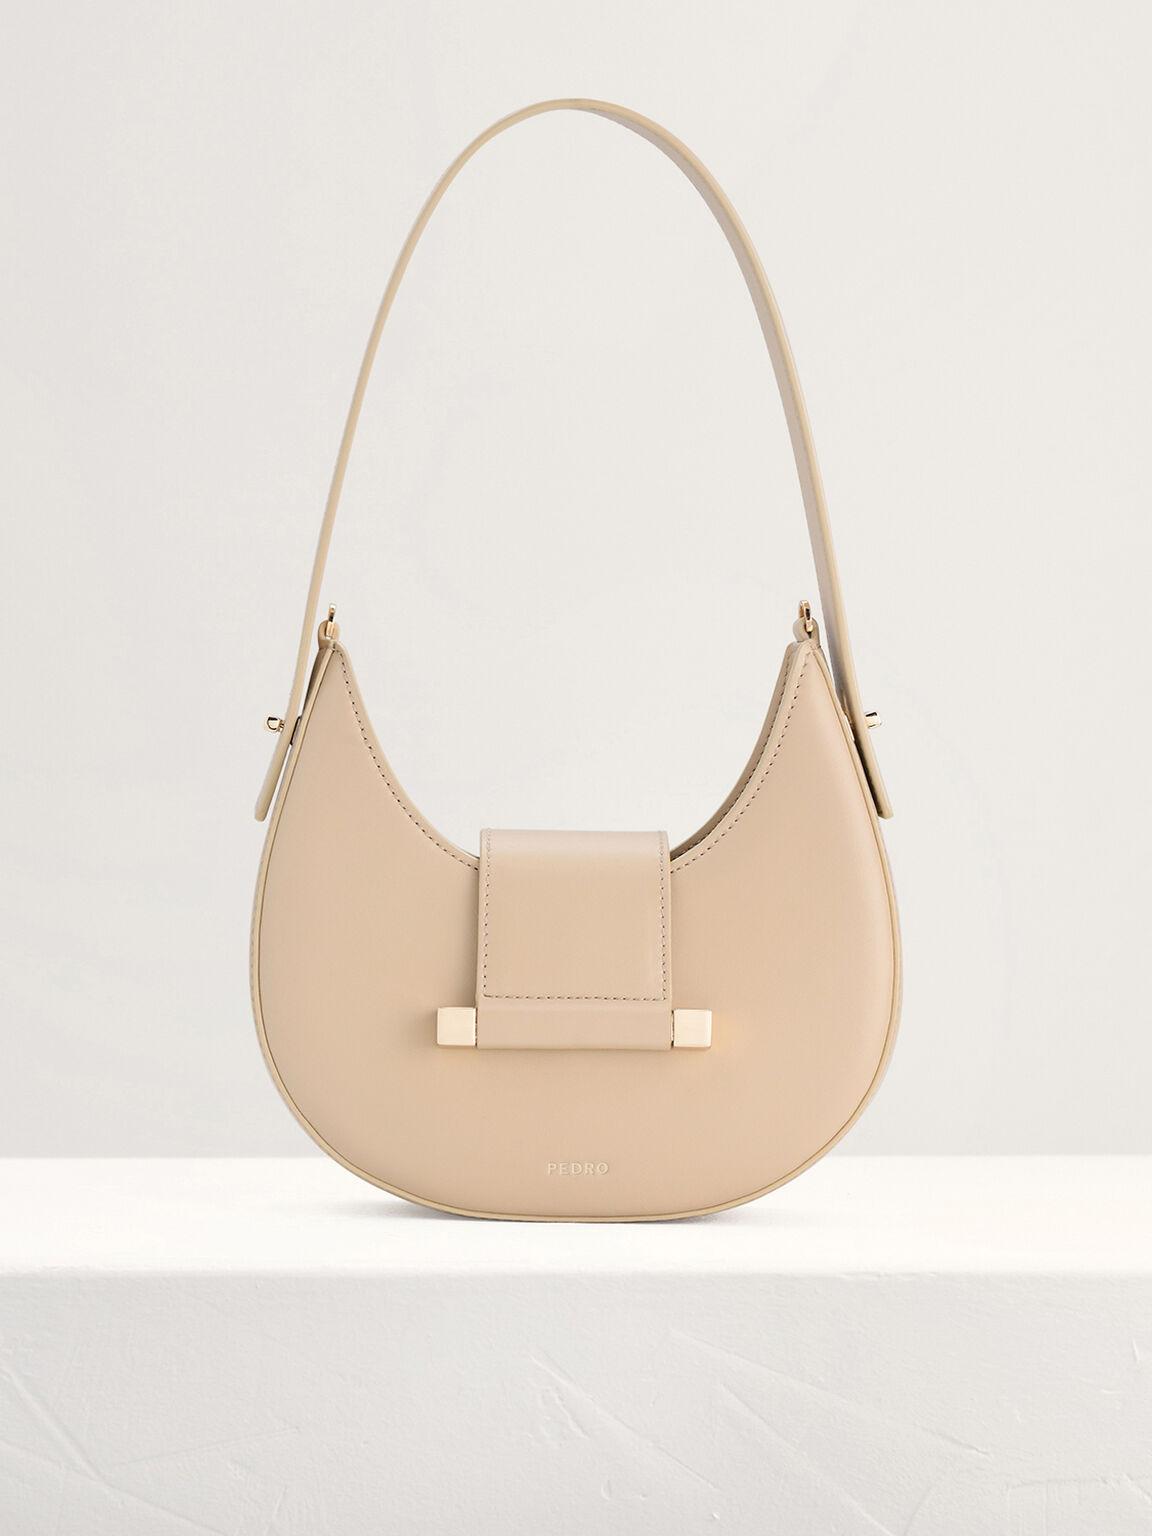 Mini Hobo Bag, Beige, hi-res